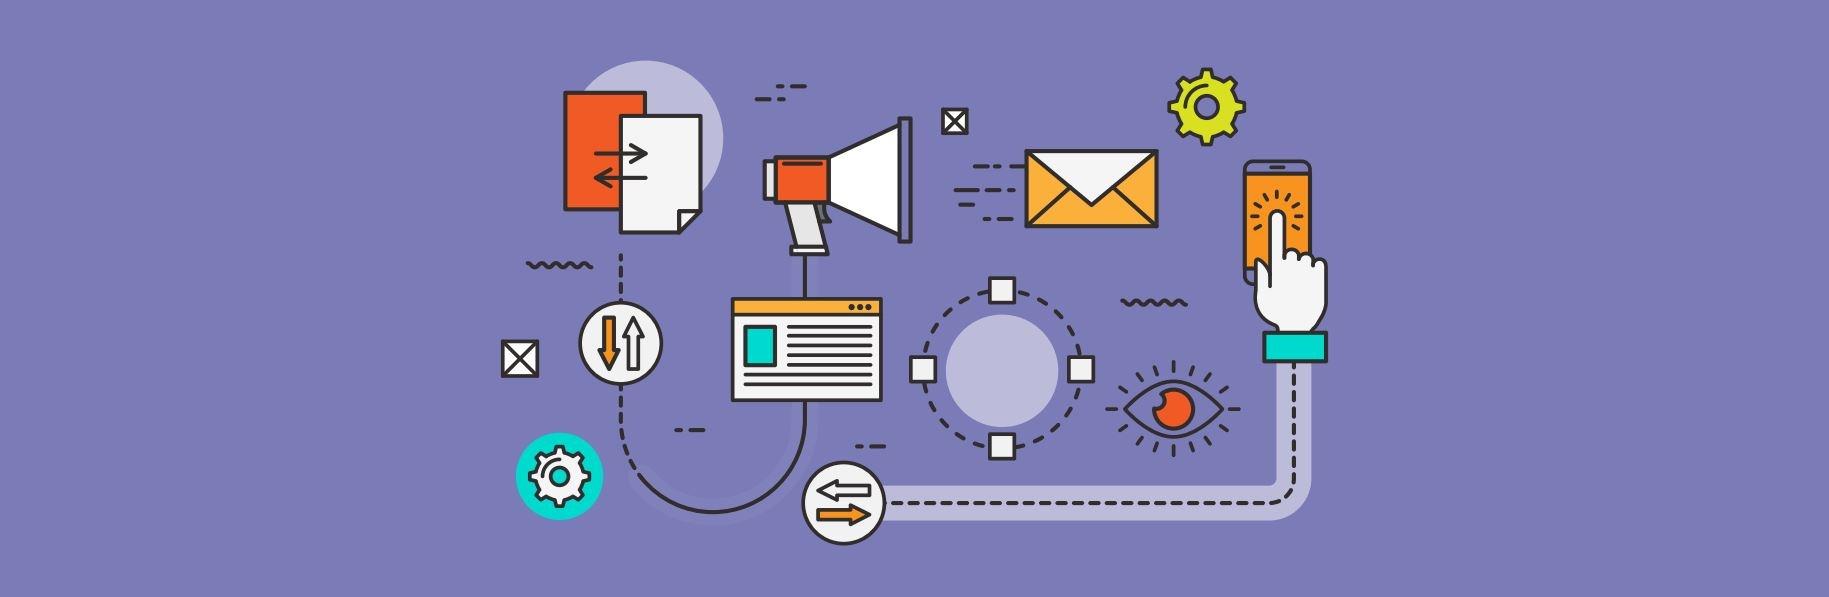 Estrategia Marketing Digital 360 portada LP.jpg